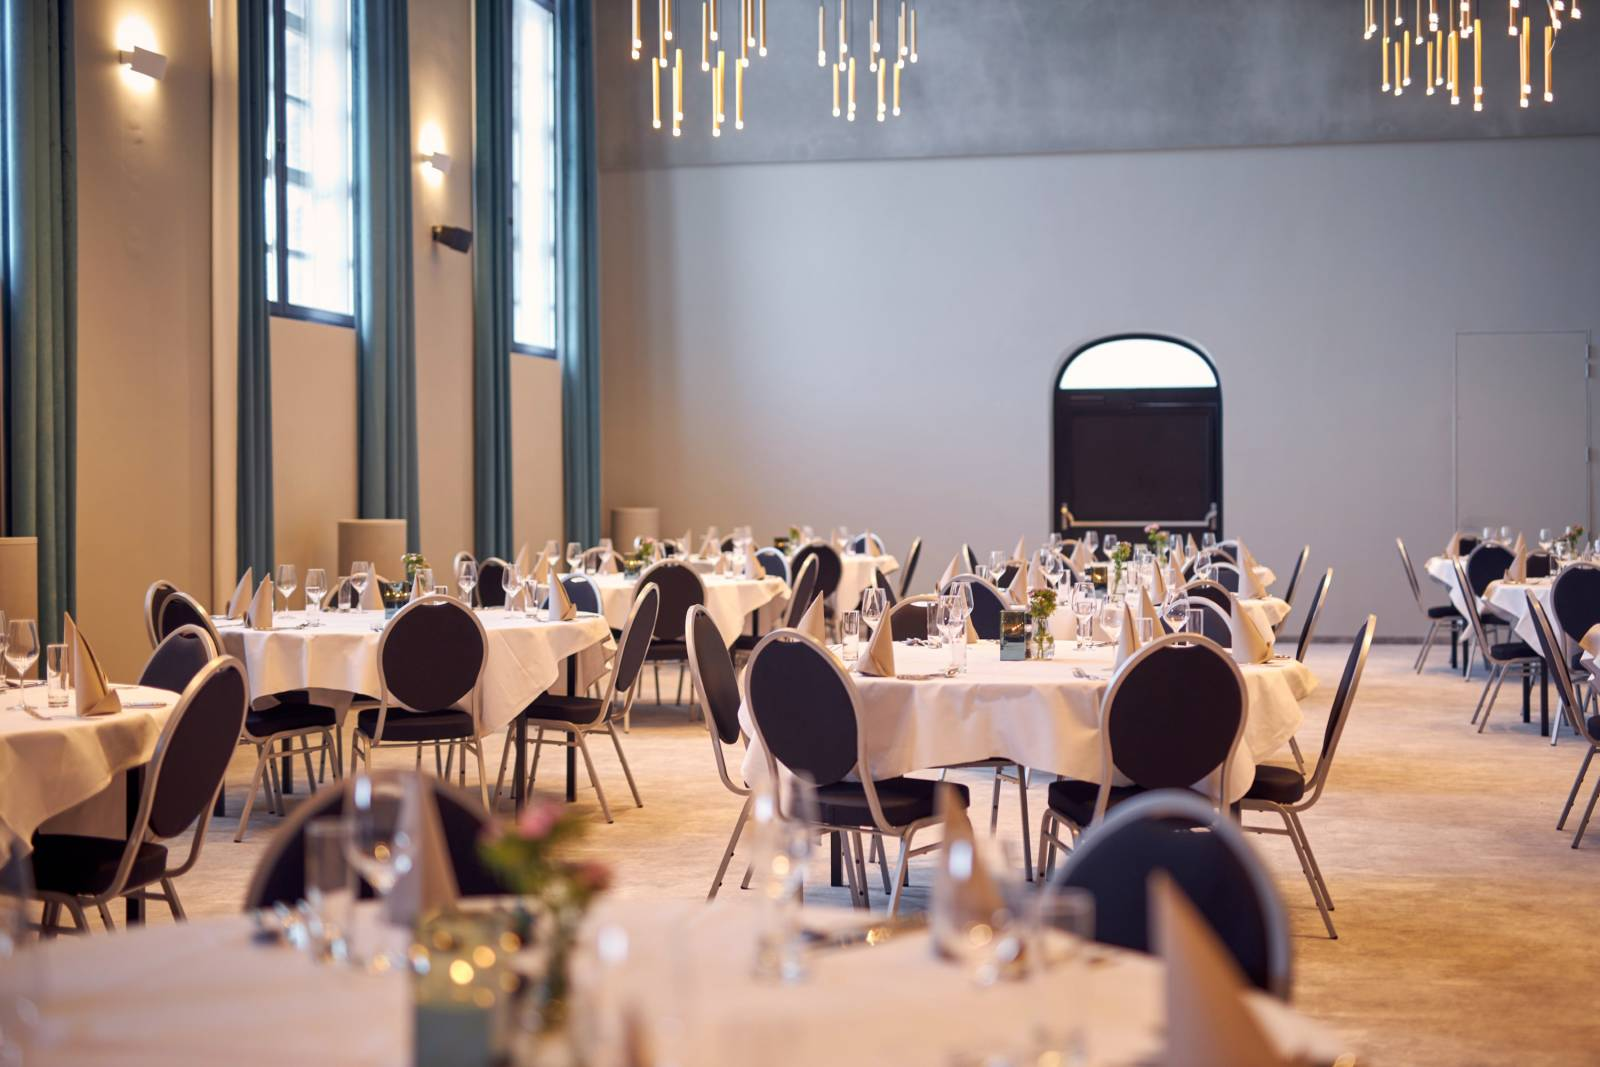 Feestal - Van der Valk hotel Mechelen - House of Weddings (15)